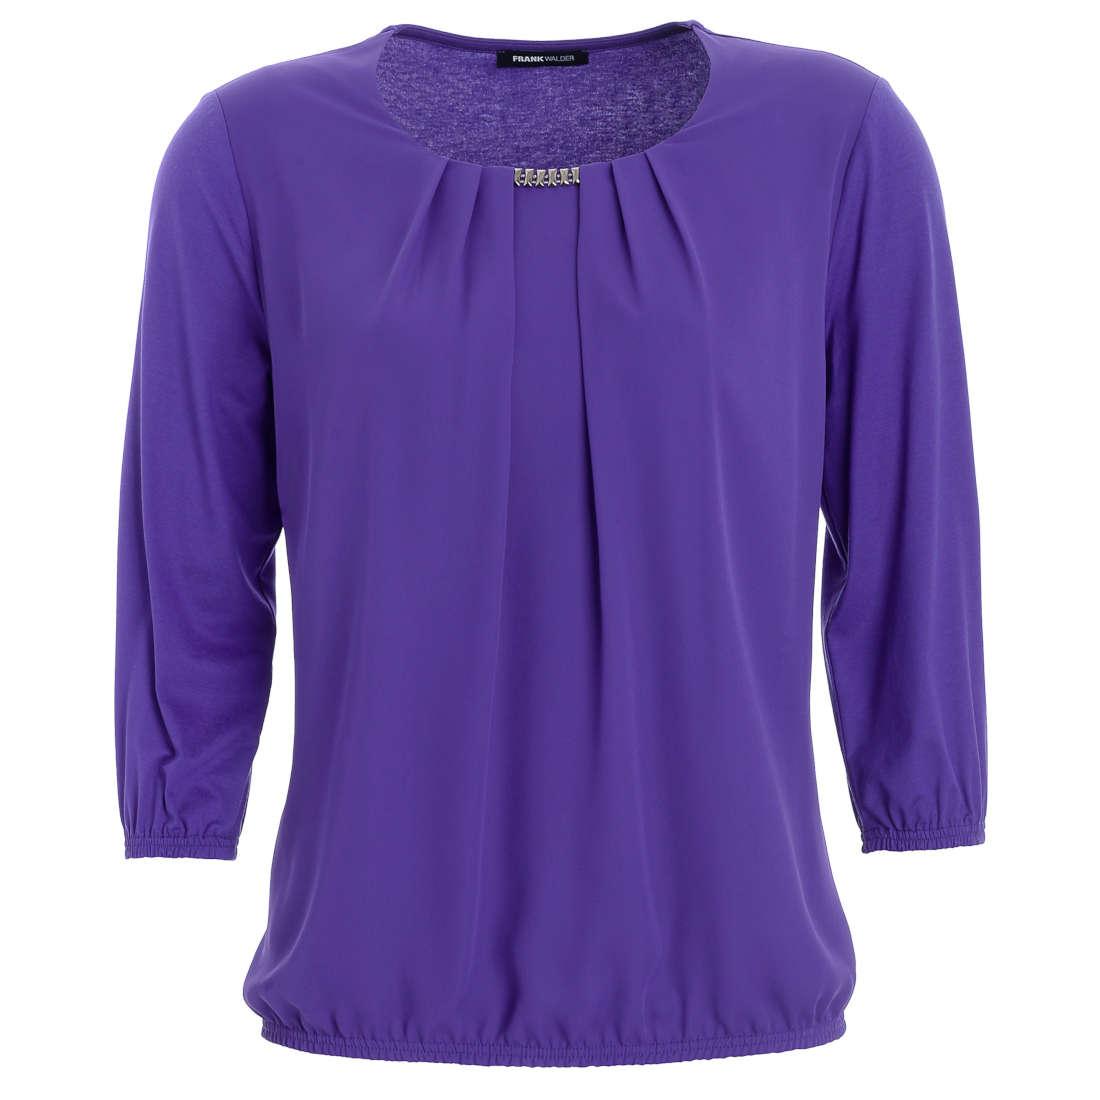 Smit Mode:  Frank Walder blouse 621430 in het Lavendel